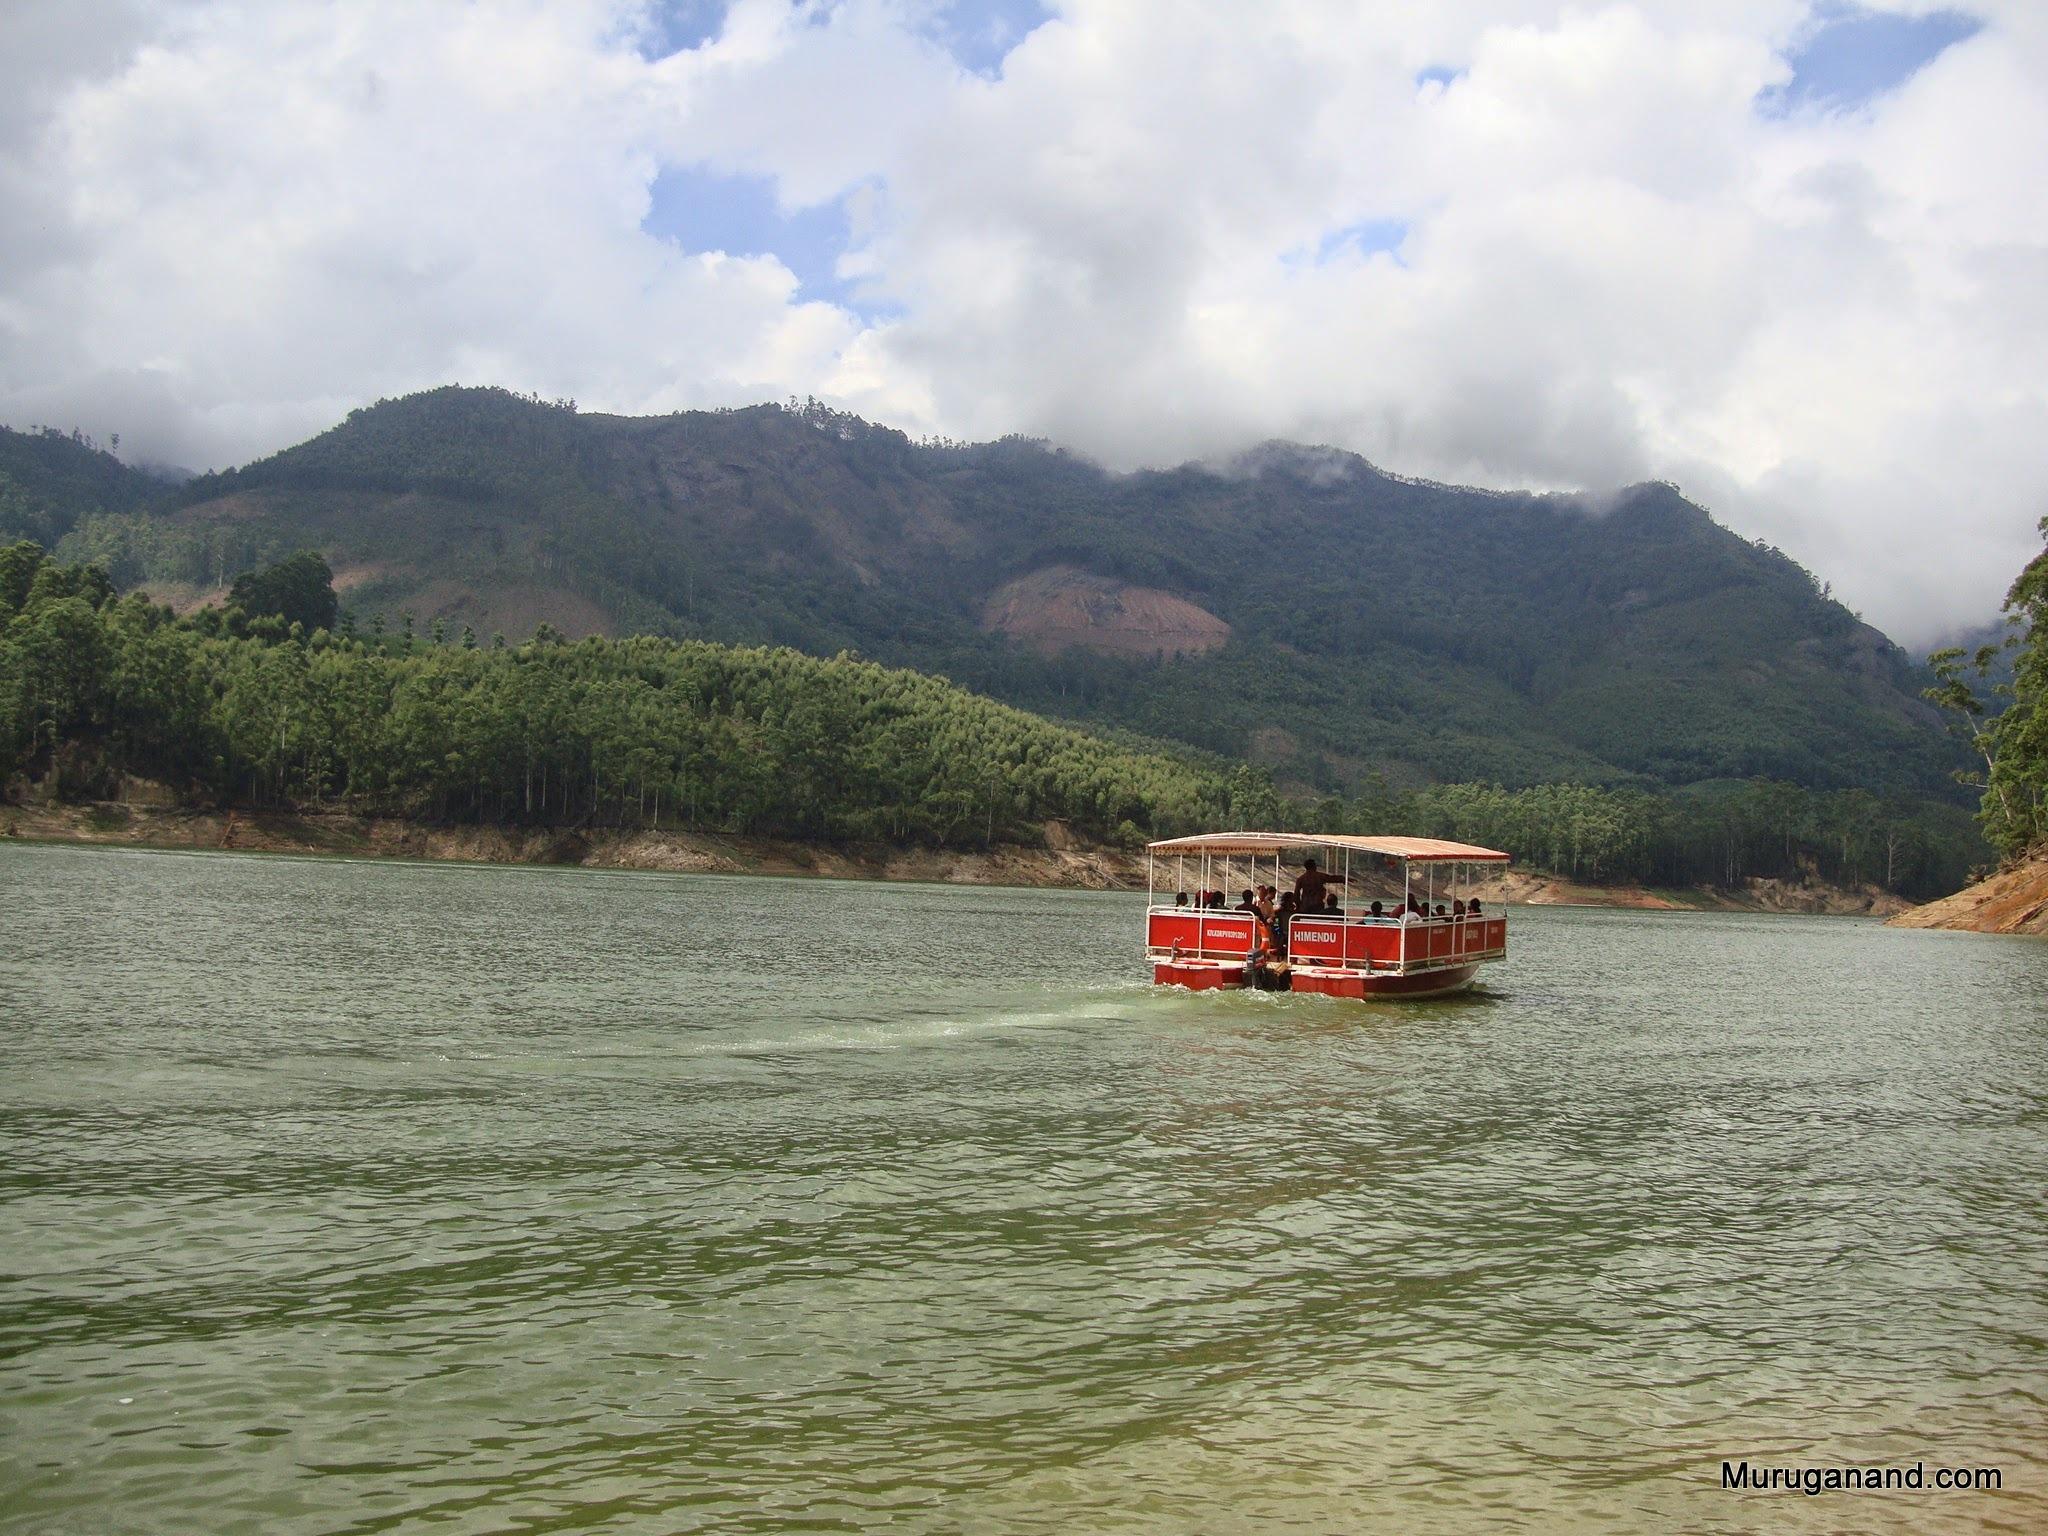 Lake surroundings are scenic